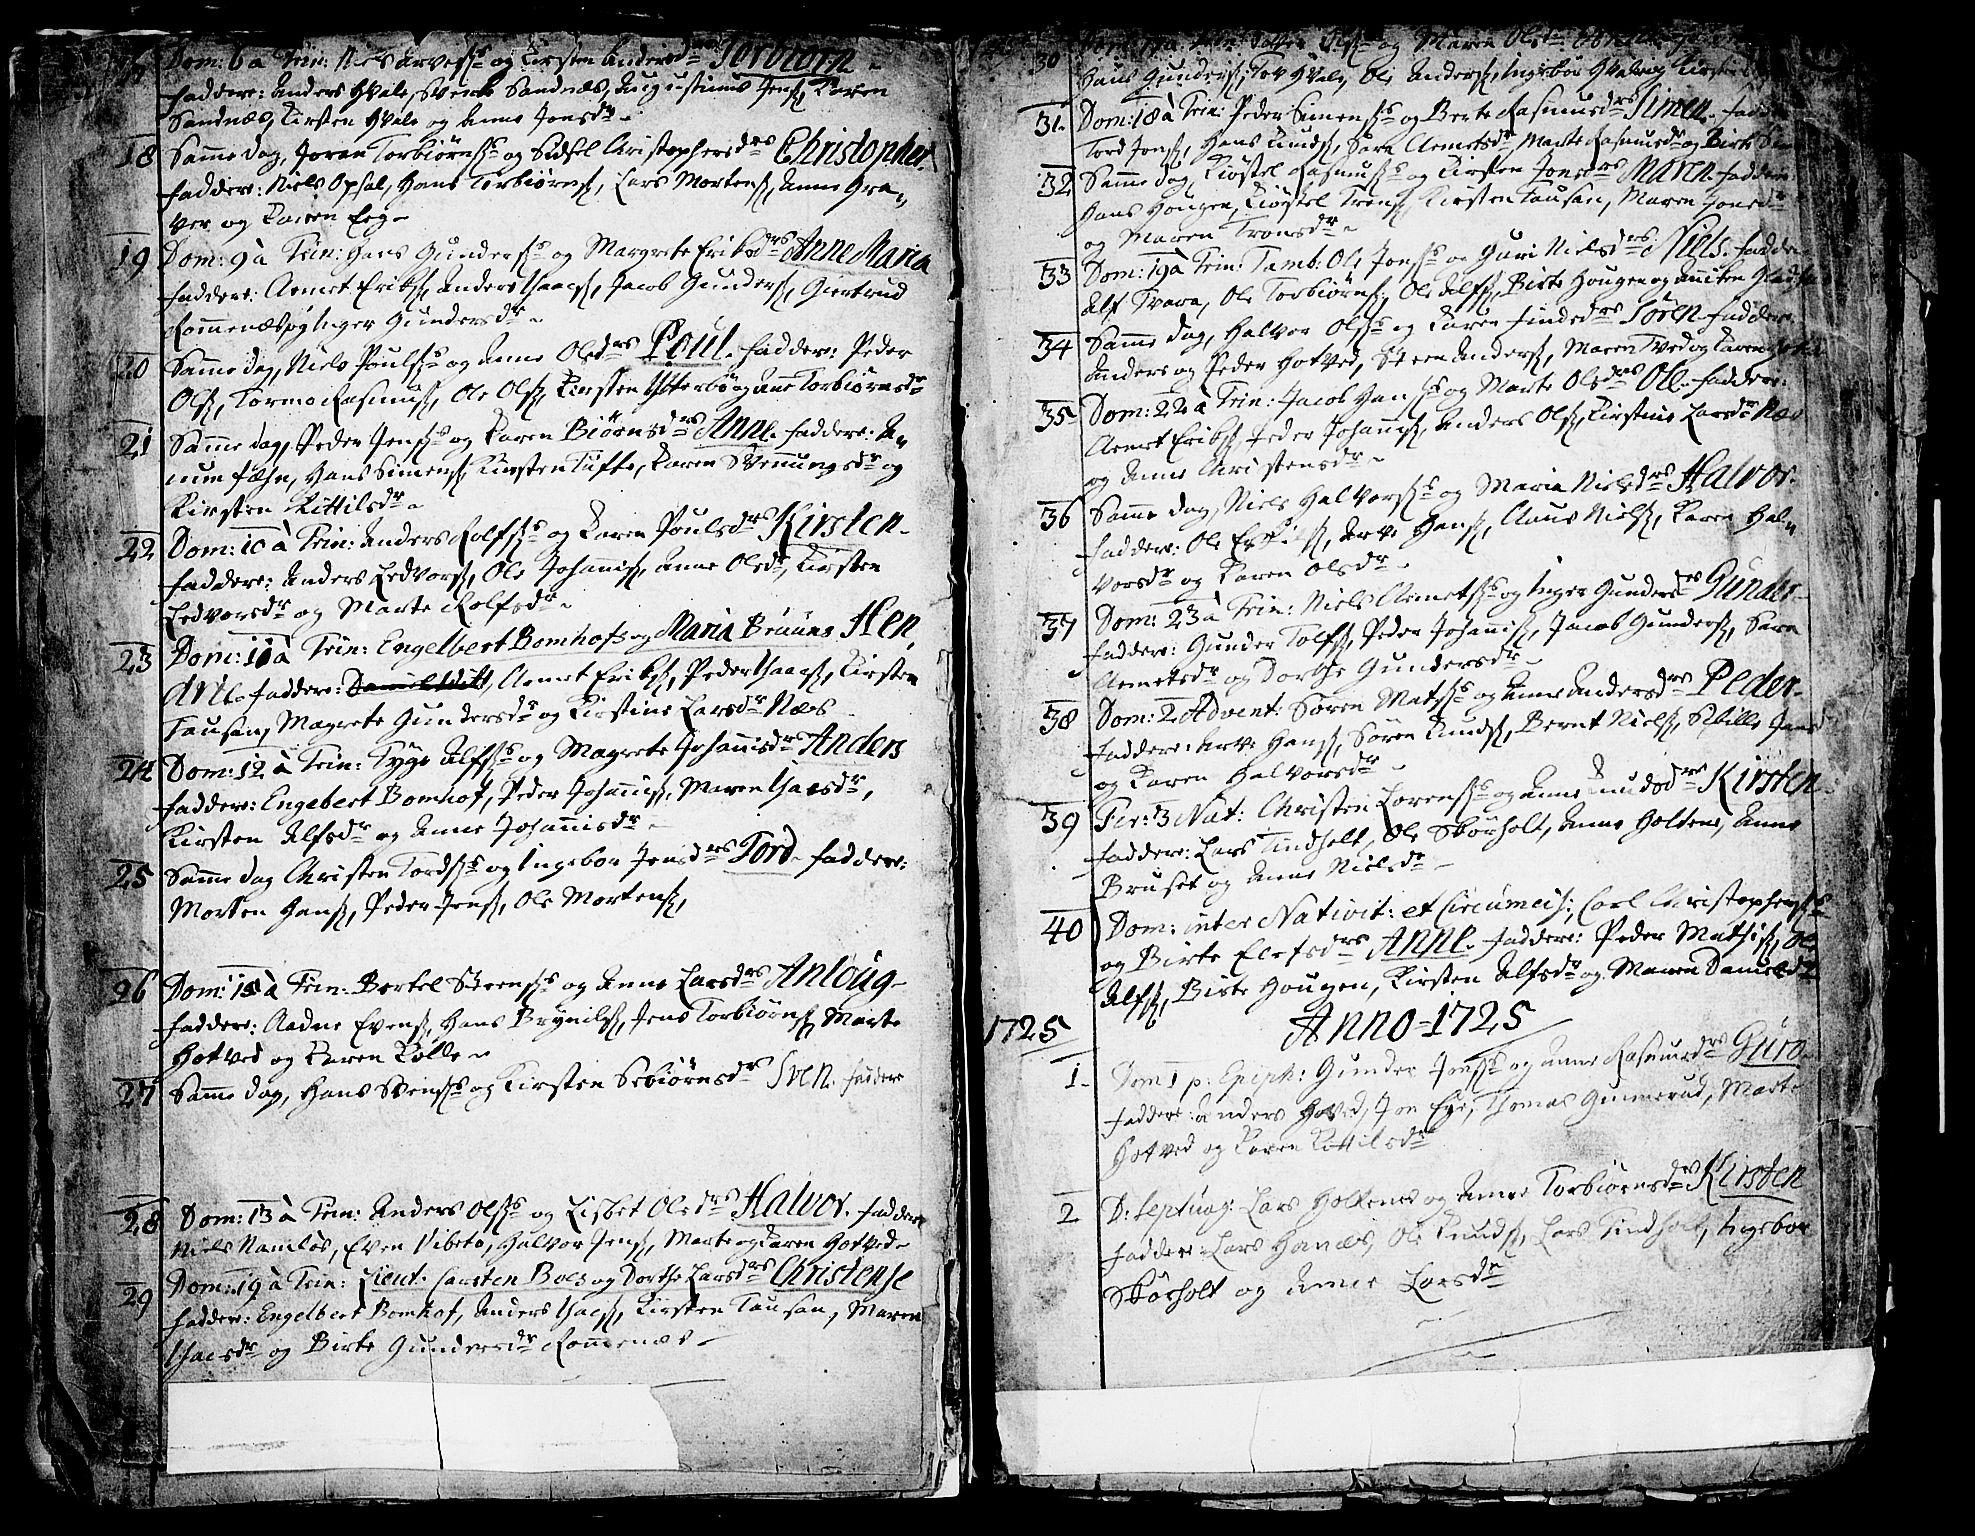 SAKO, Holla kirkebøker, F/Fa/L0001: Ministerialbok nr. 1, 1717-1779, s. 11